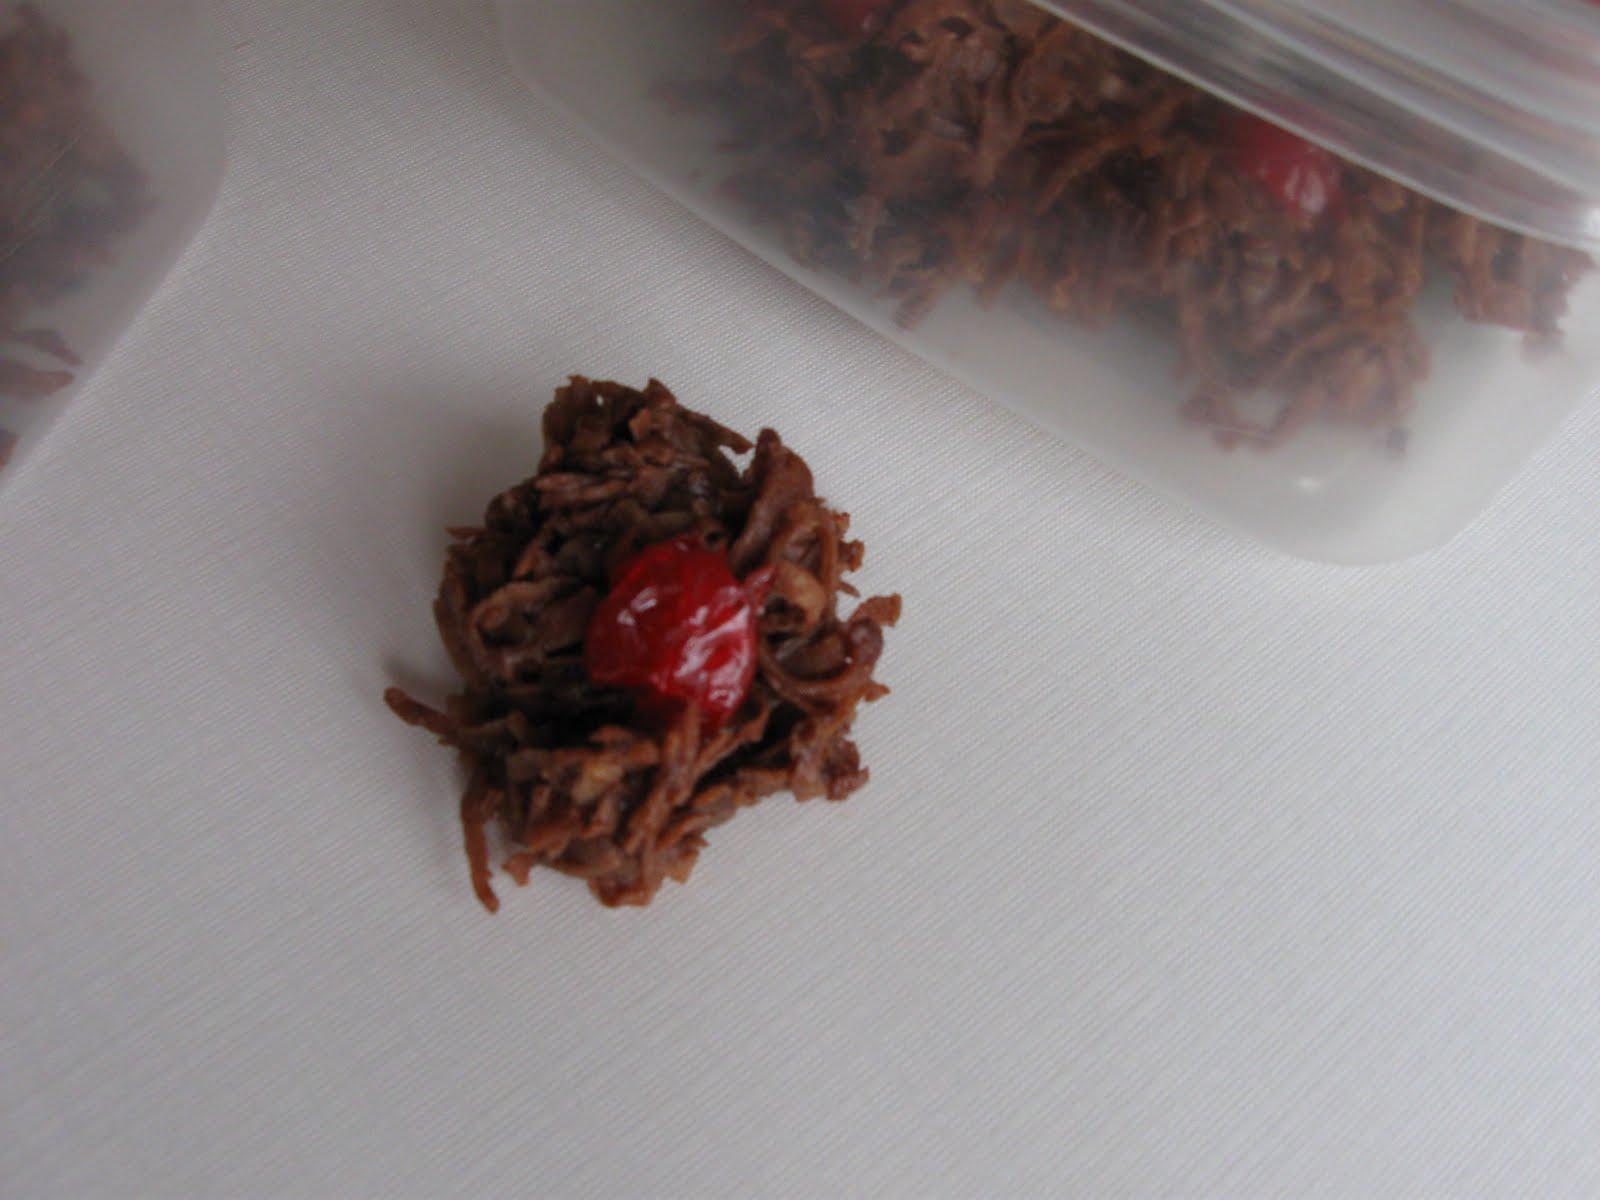 Cattapan's Cookies & Cakes: Cherry Chocolate Macaroons